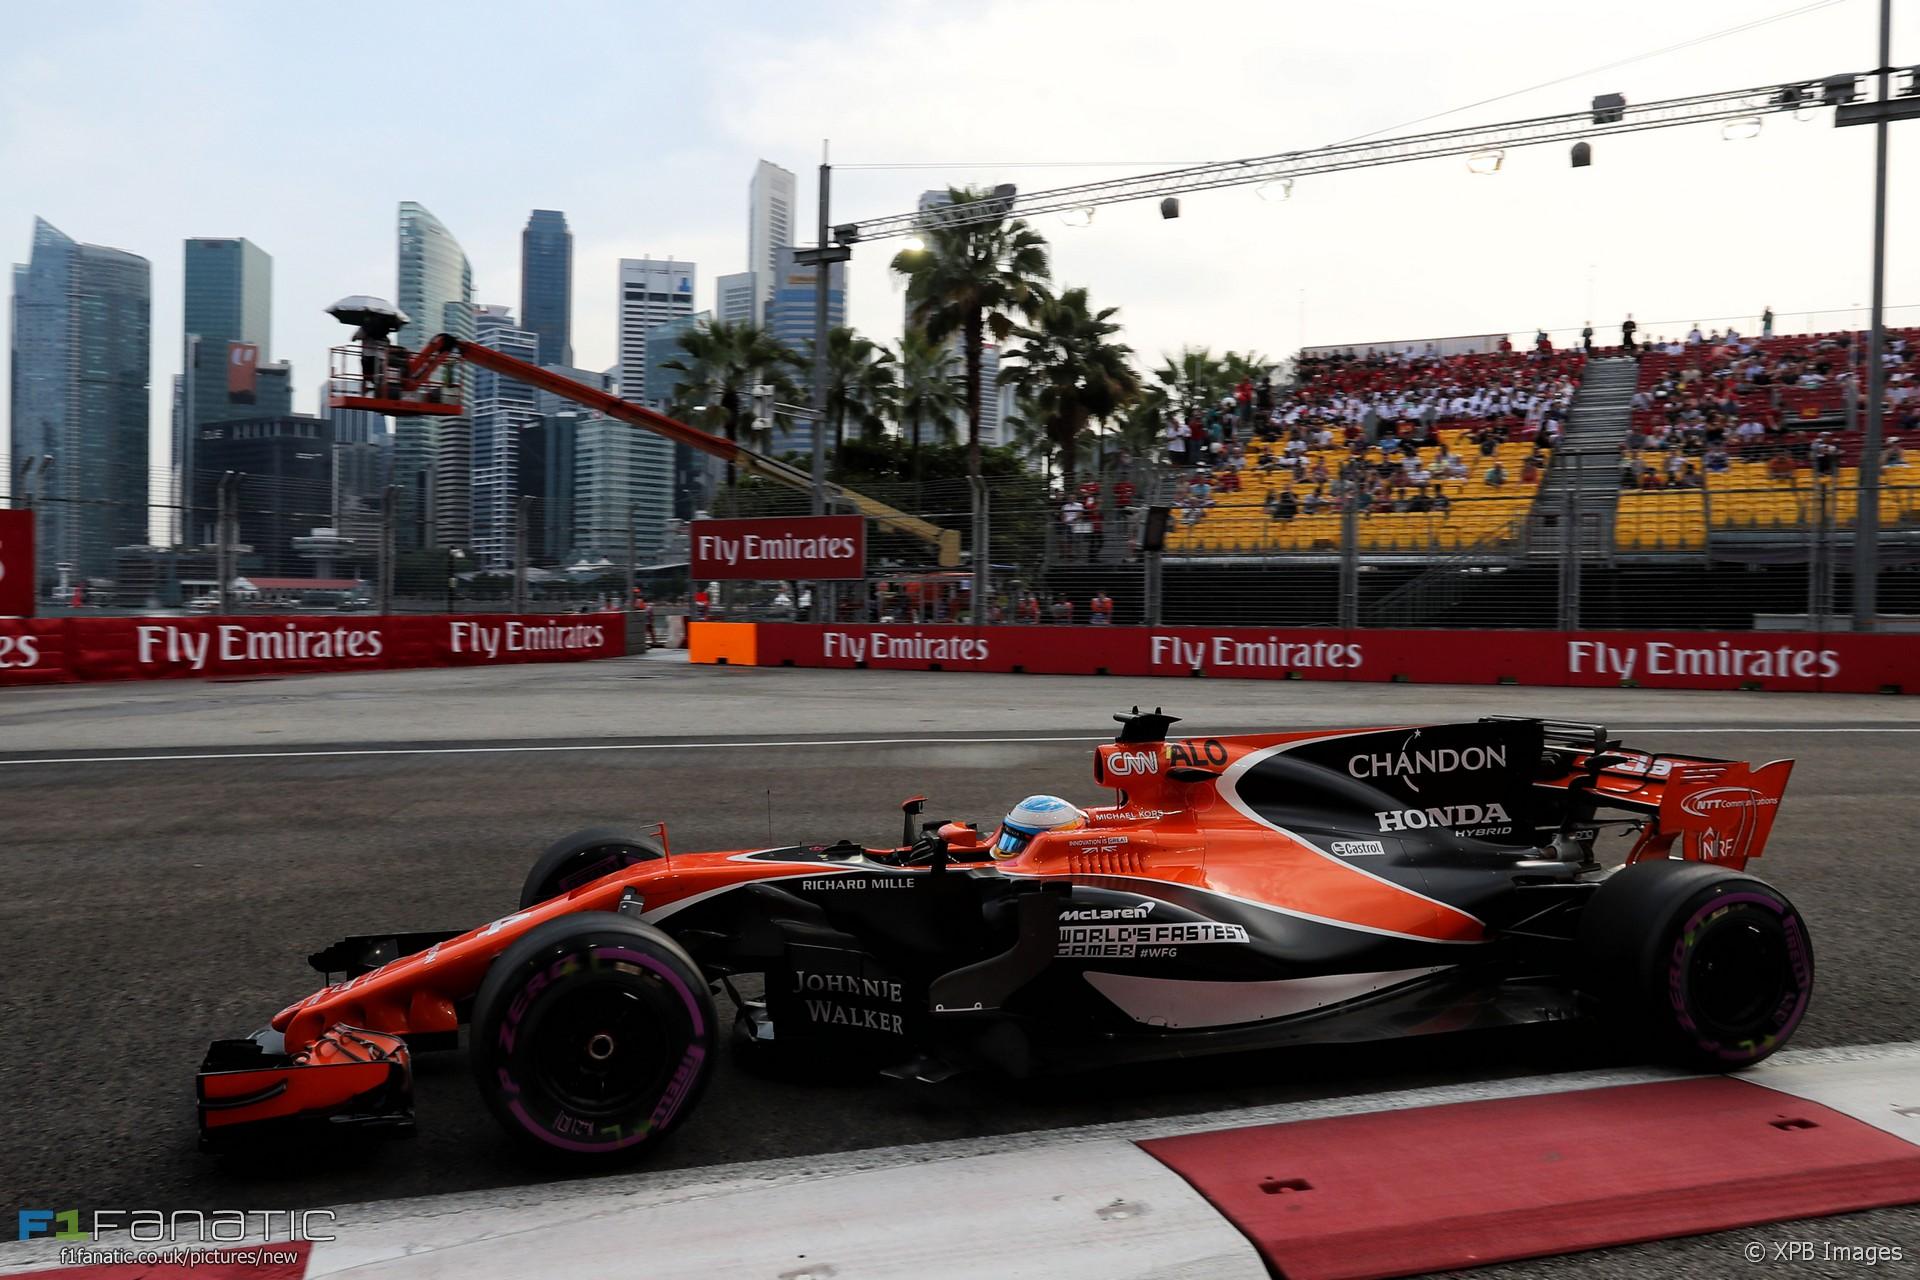 Fernando Alonso Mclaren Singapore 2017 F1 Fanatic